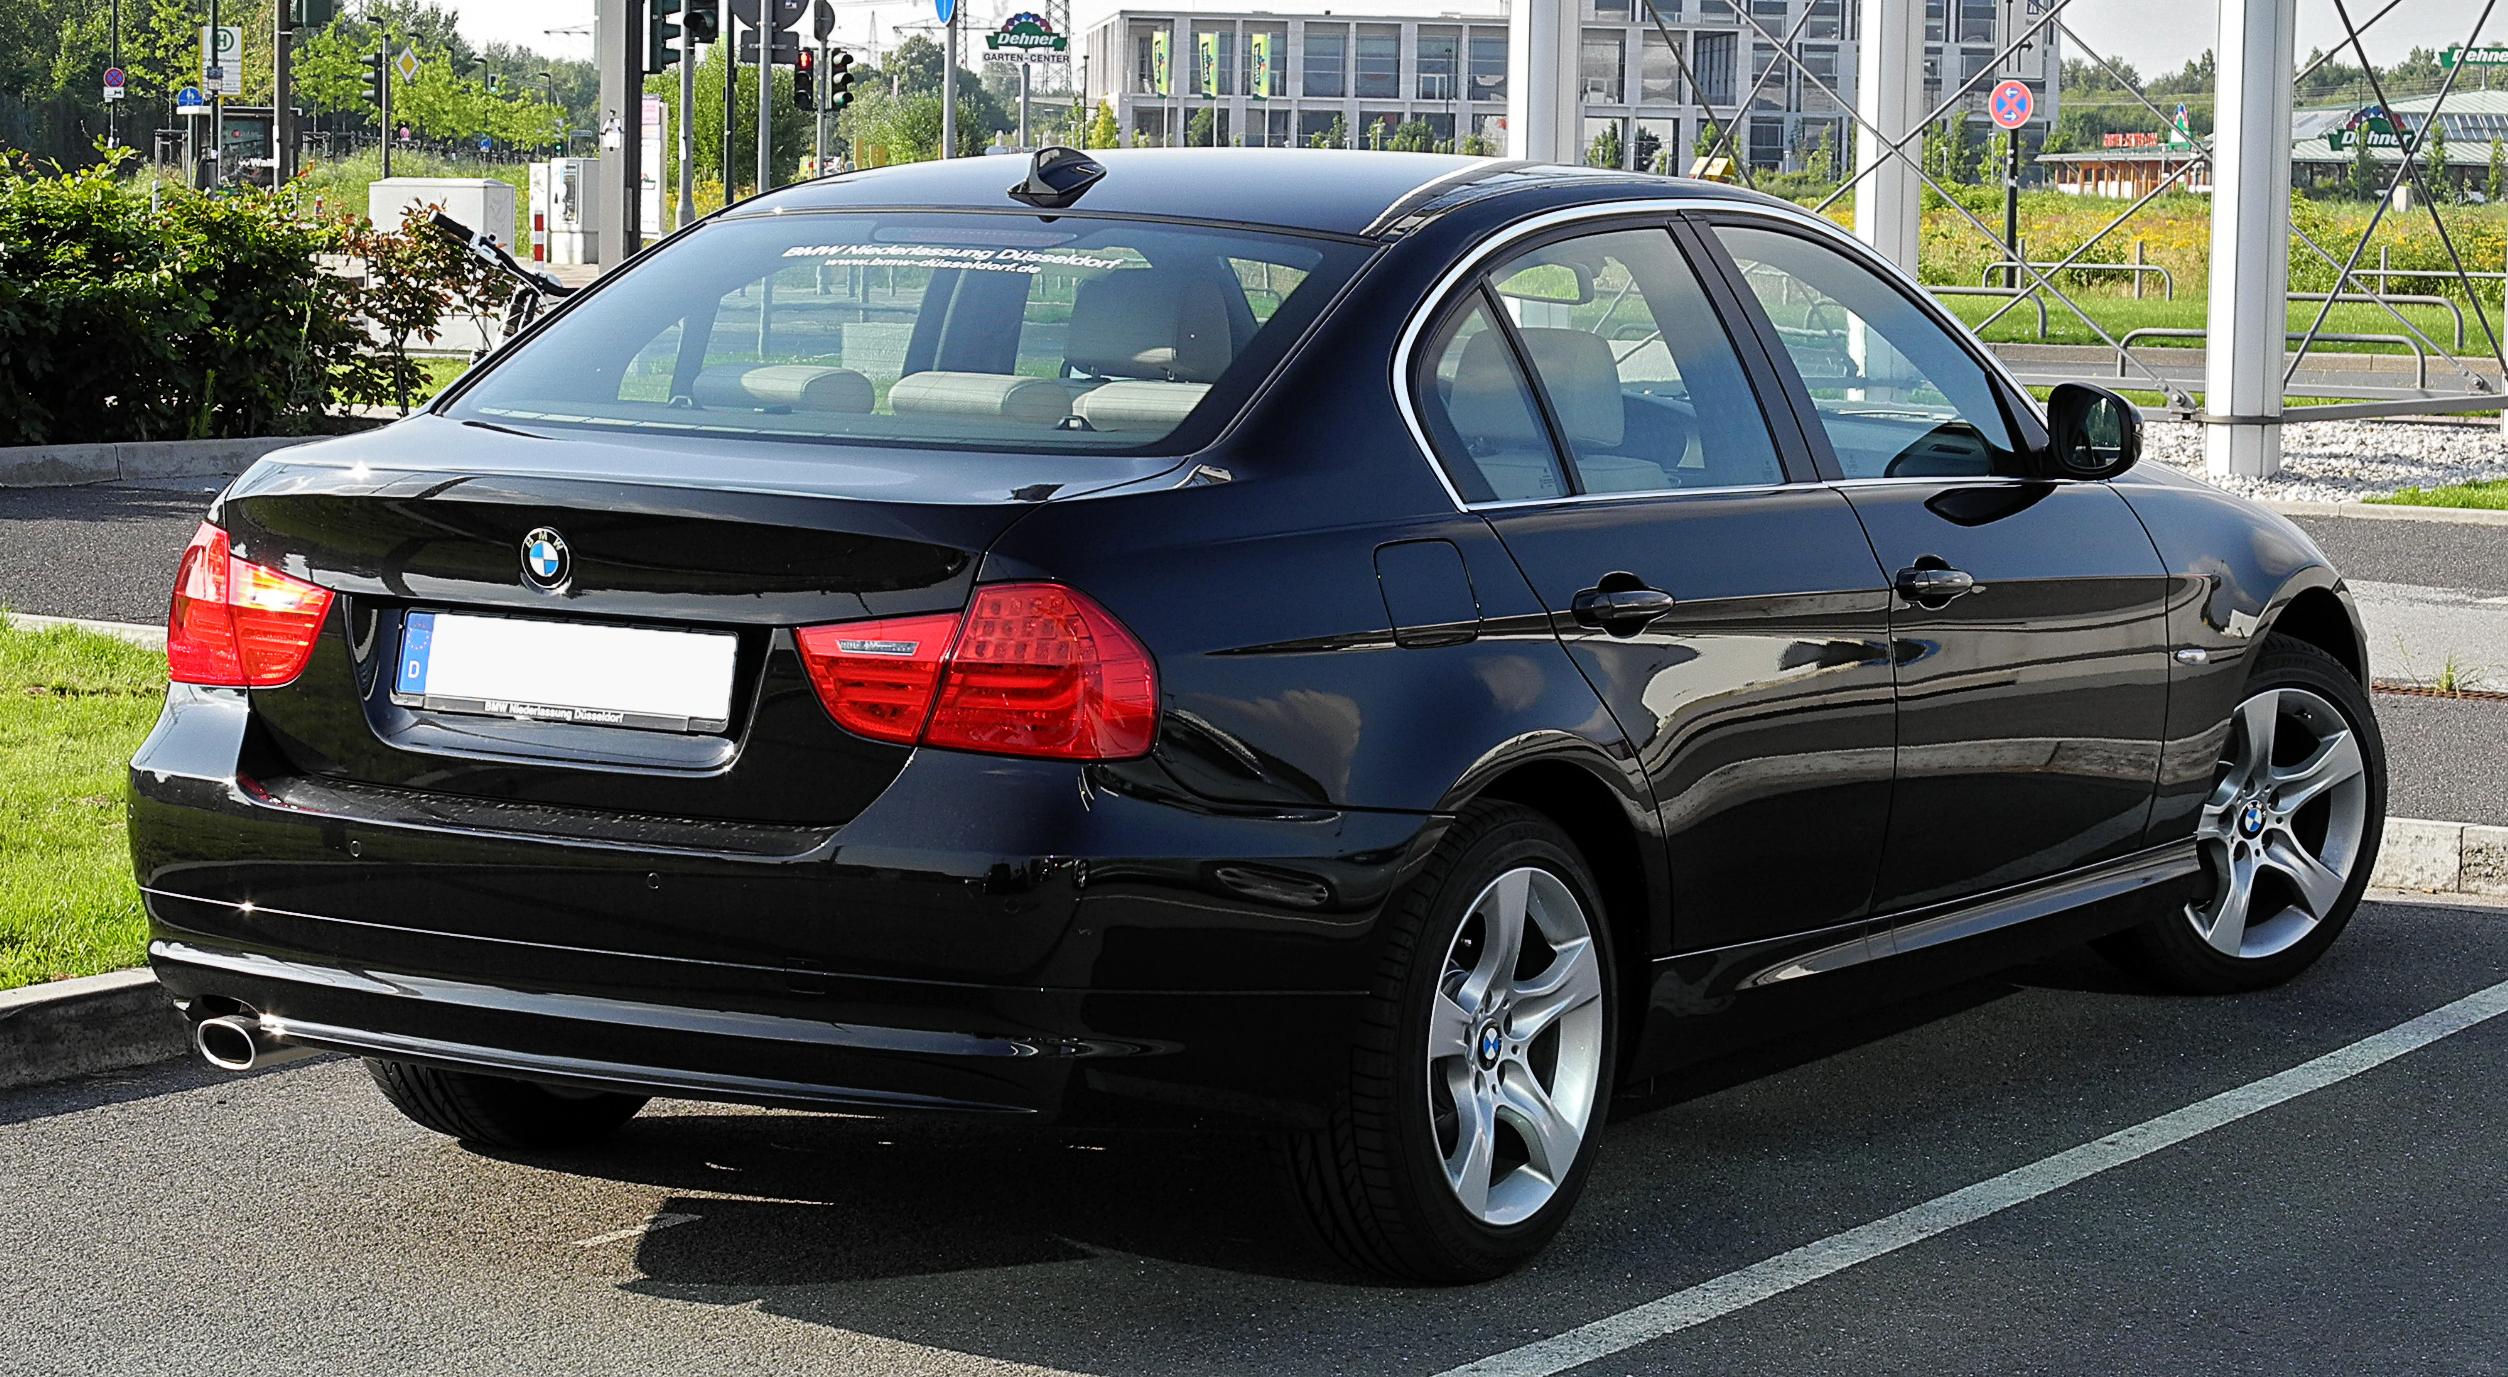 File:BMW 3er (E90, Facelift) – Heckansicht, 26. Juni 2011 ...